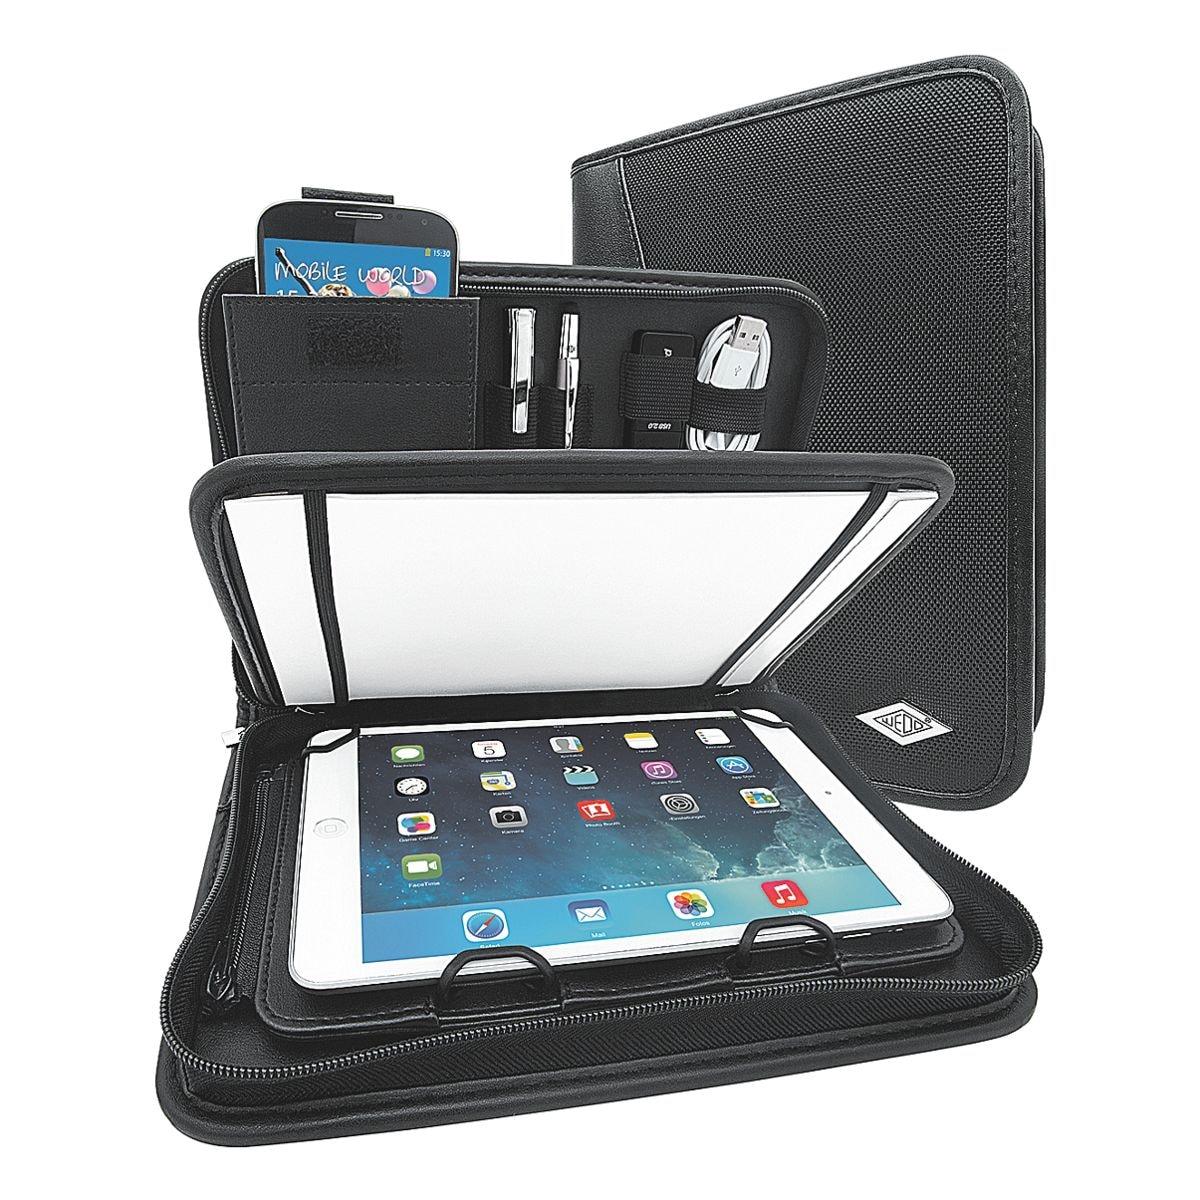 Wedo Tablet-Organizer »Elegance«, 7,9 - 8,4 Zoll Tablets